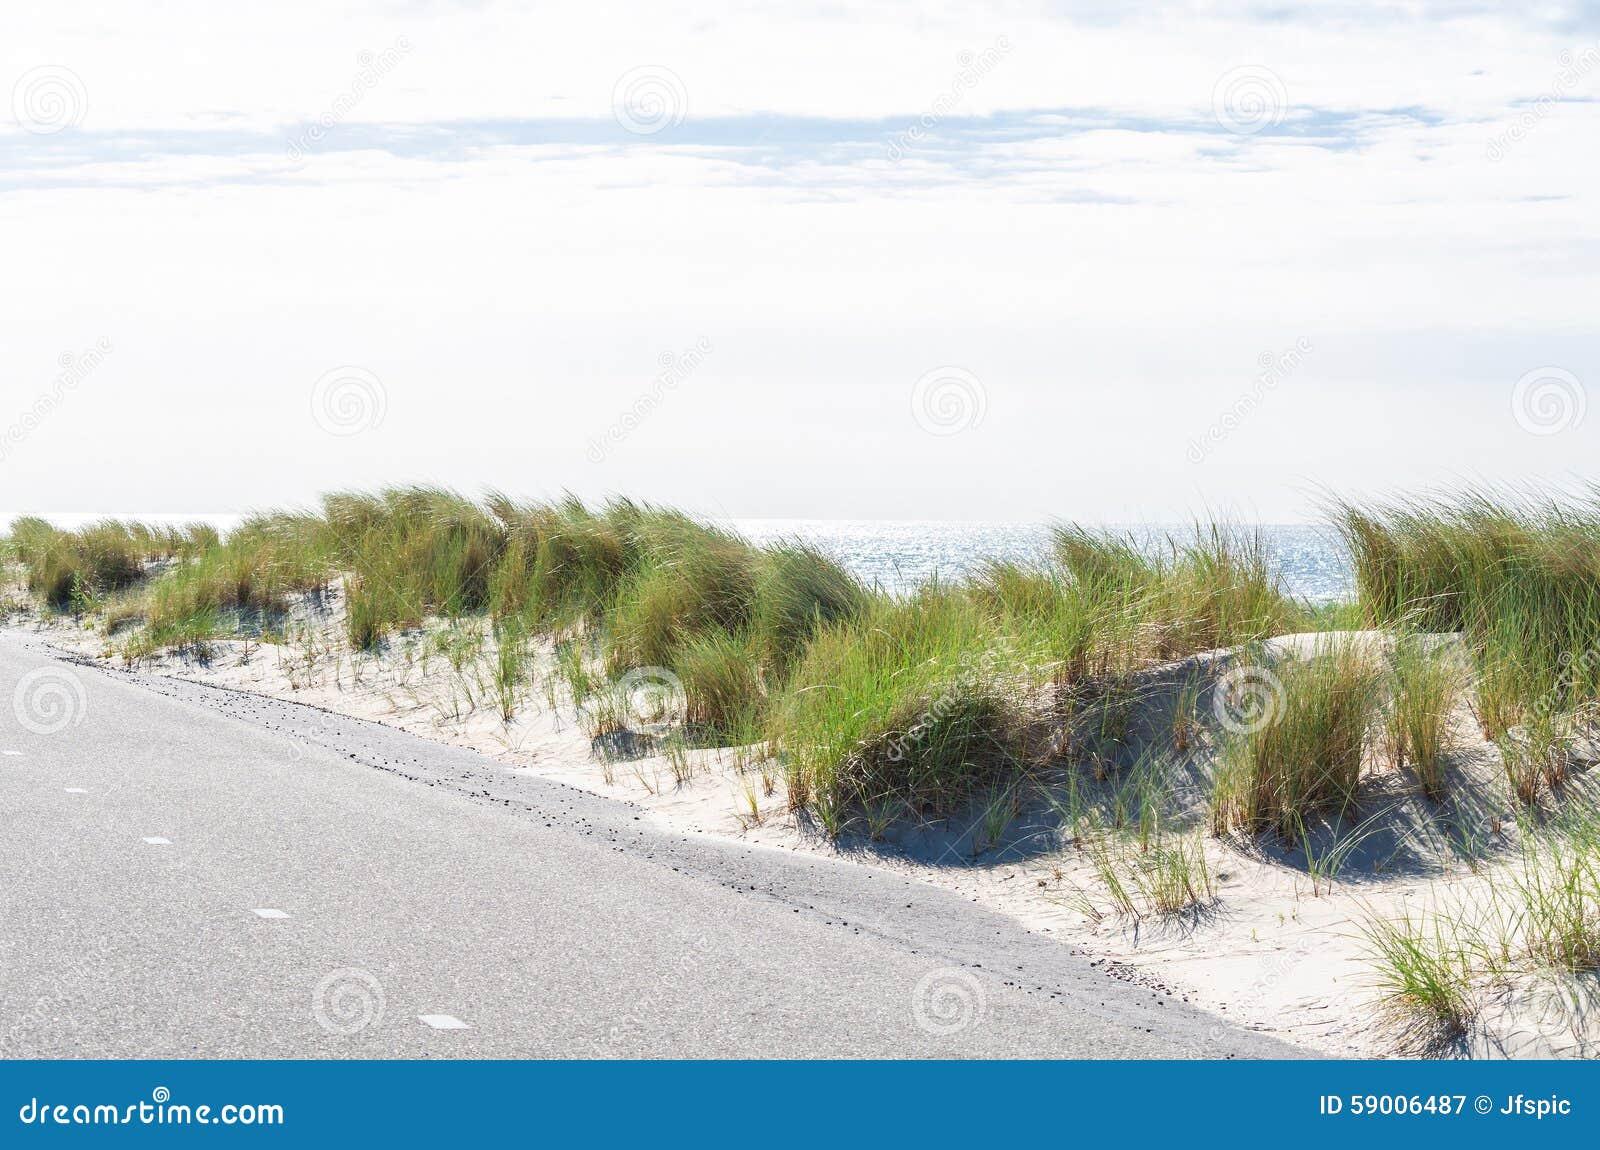 Seagrass-, strand- och sanddyn